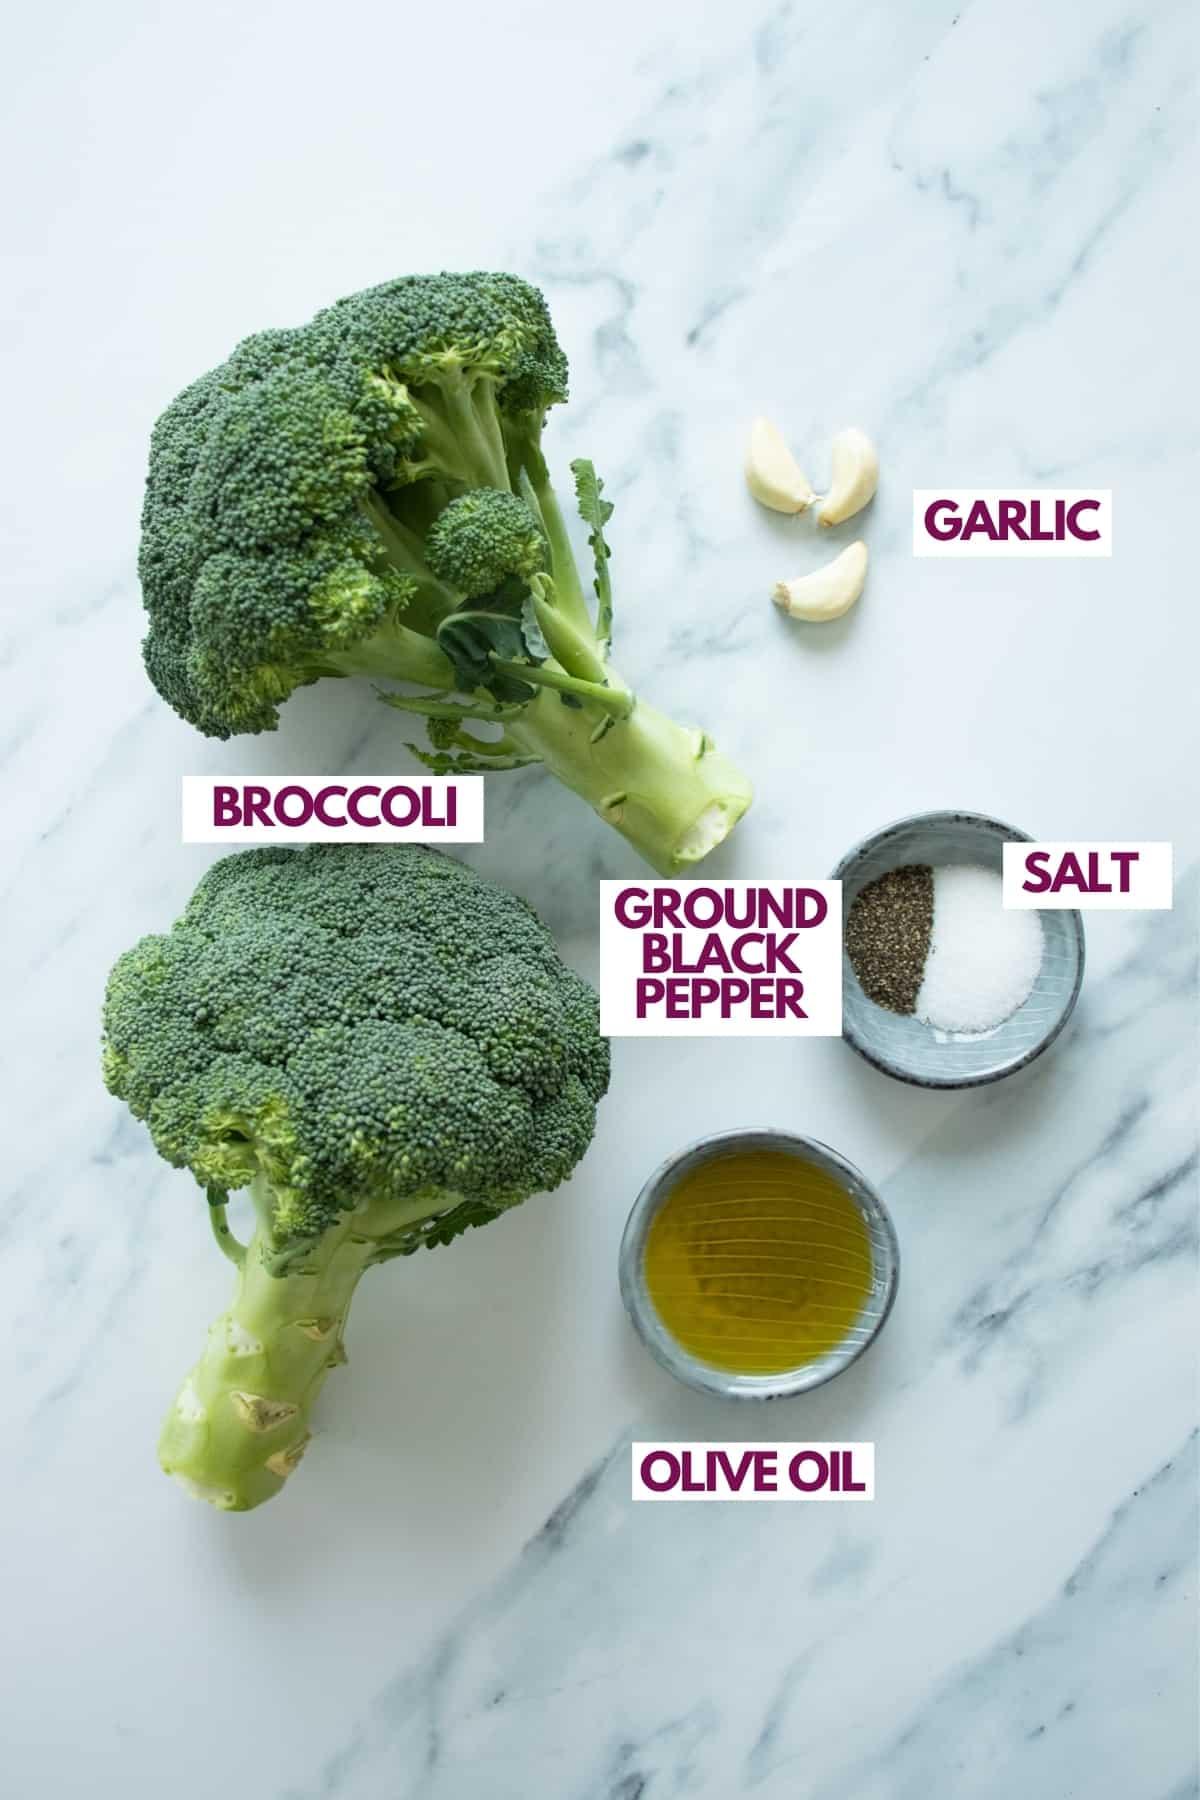 garlic roasted broccoli ingredients